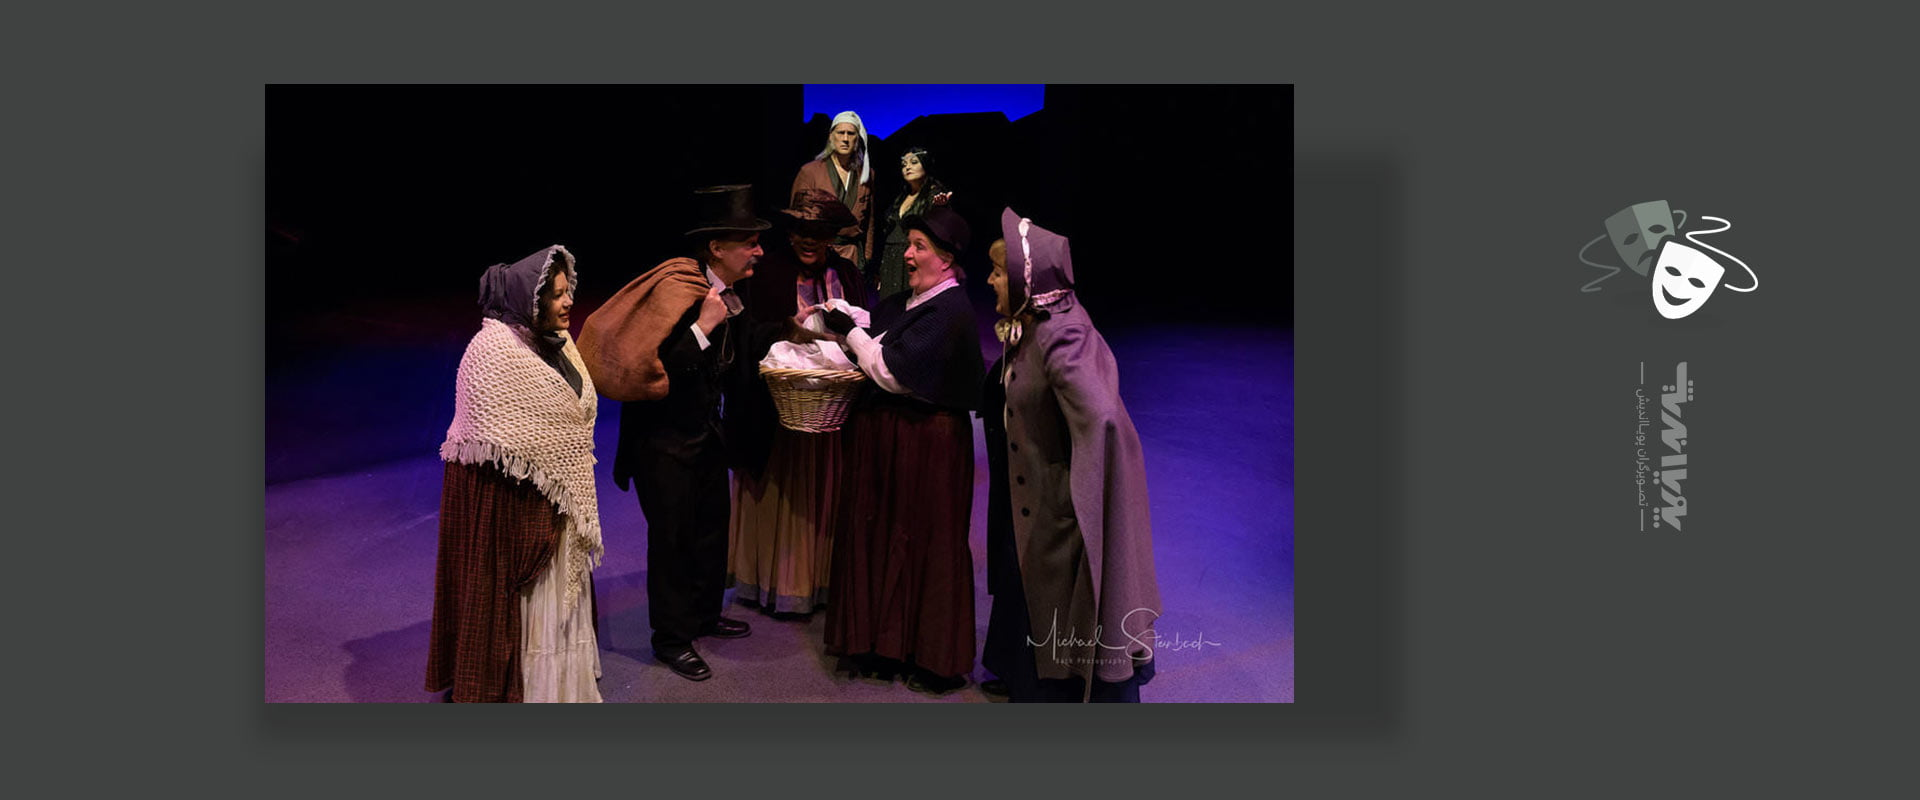 theatre photography 3 - نکات مهم برای عکاسی از تئاتر